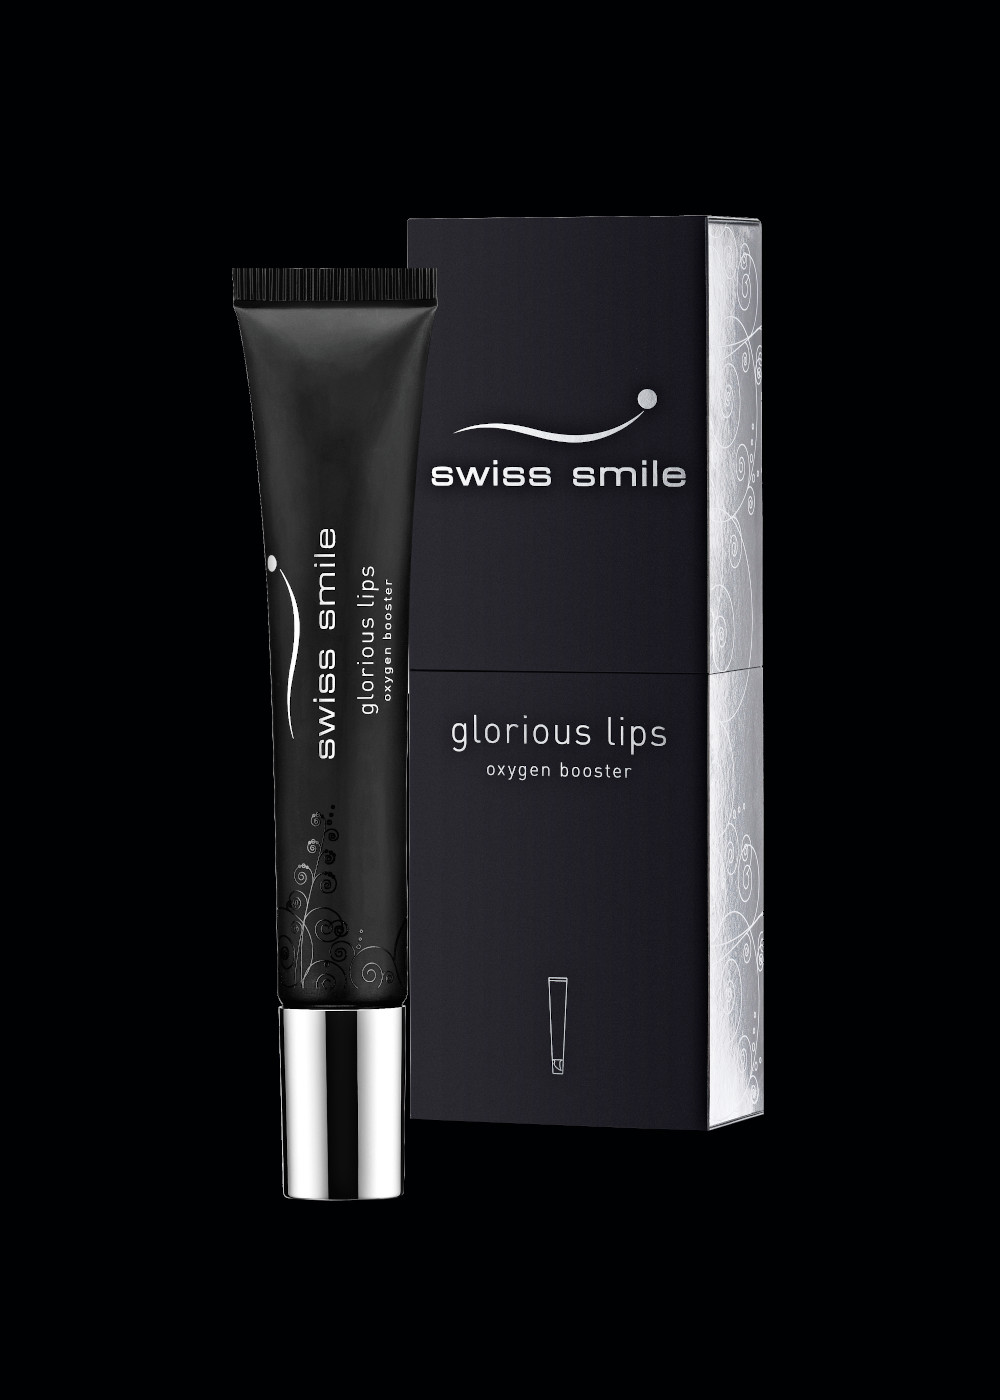 negru Glorious lips